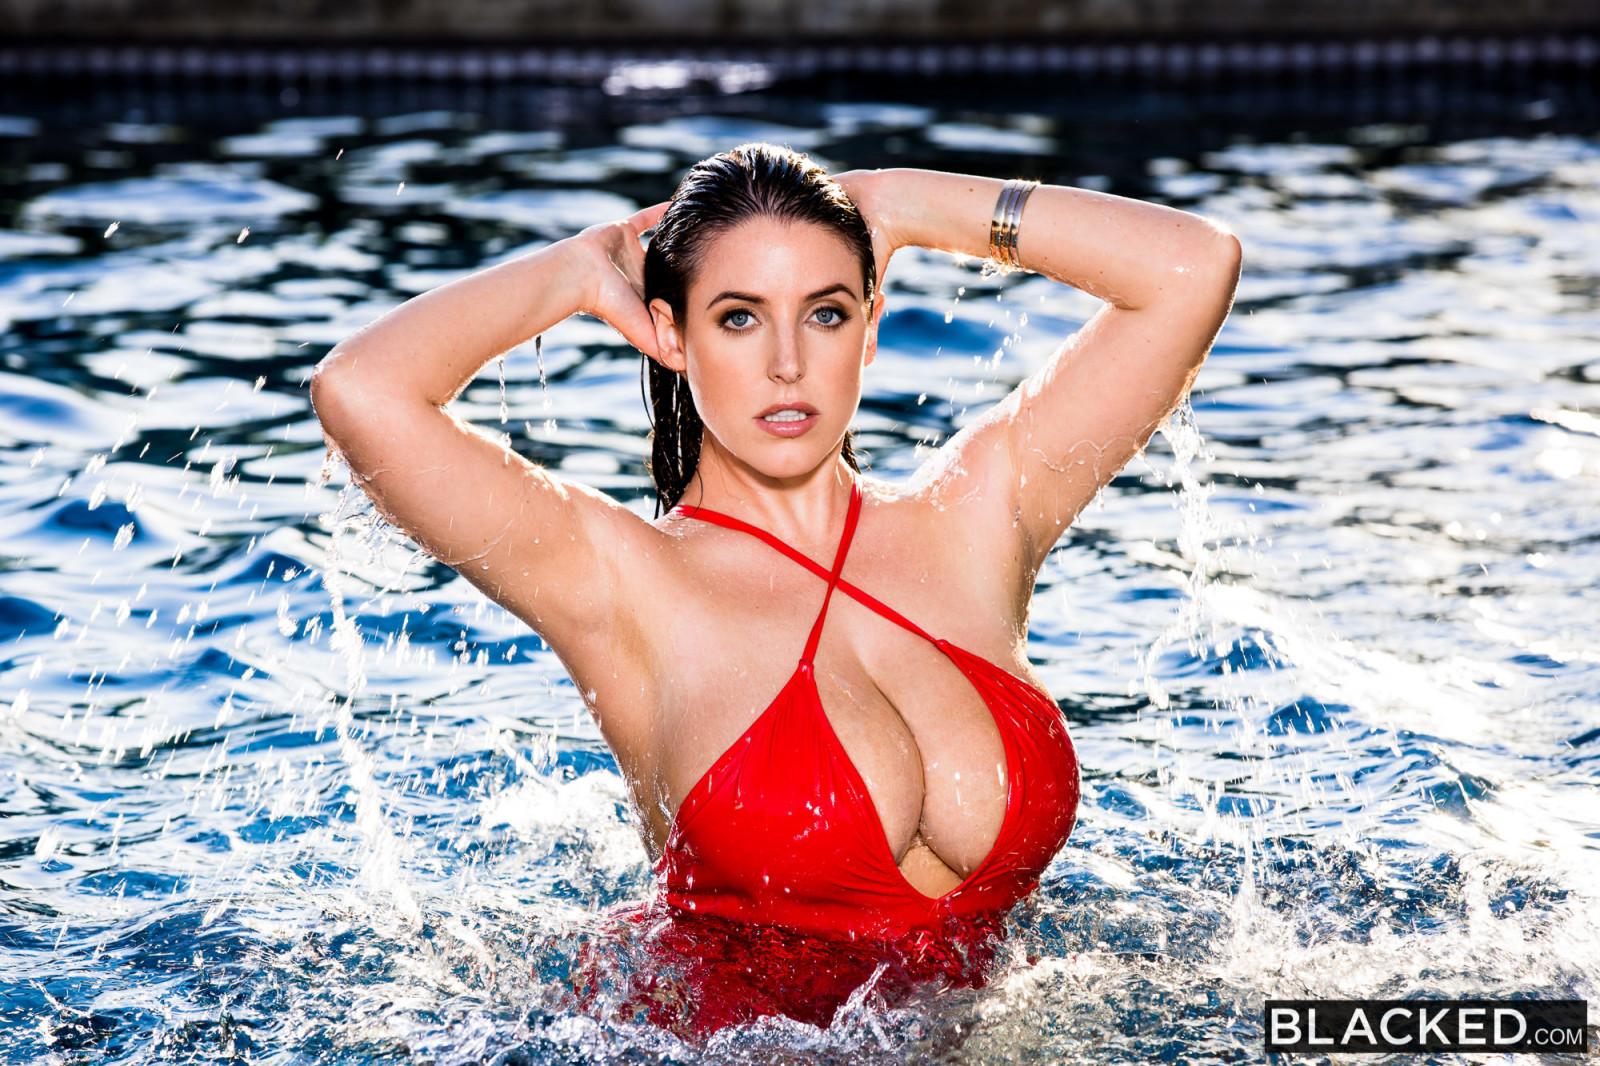 Wallpaper  Angela White, Model, Women, Swimming Pool -1182